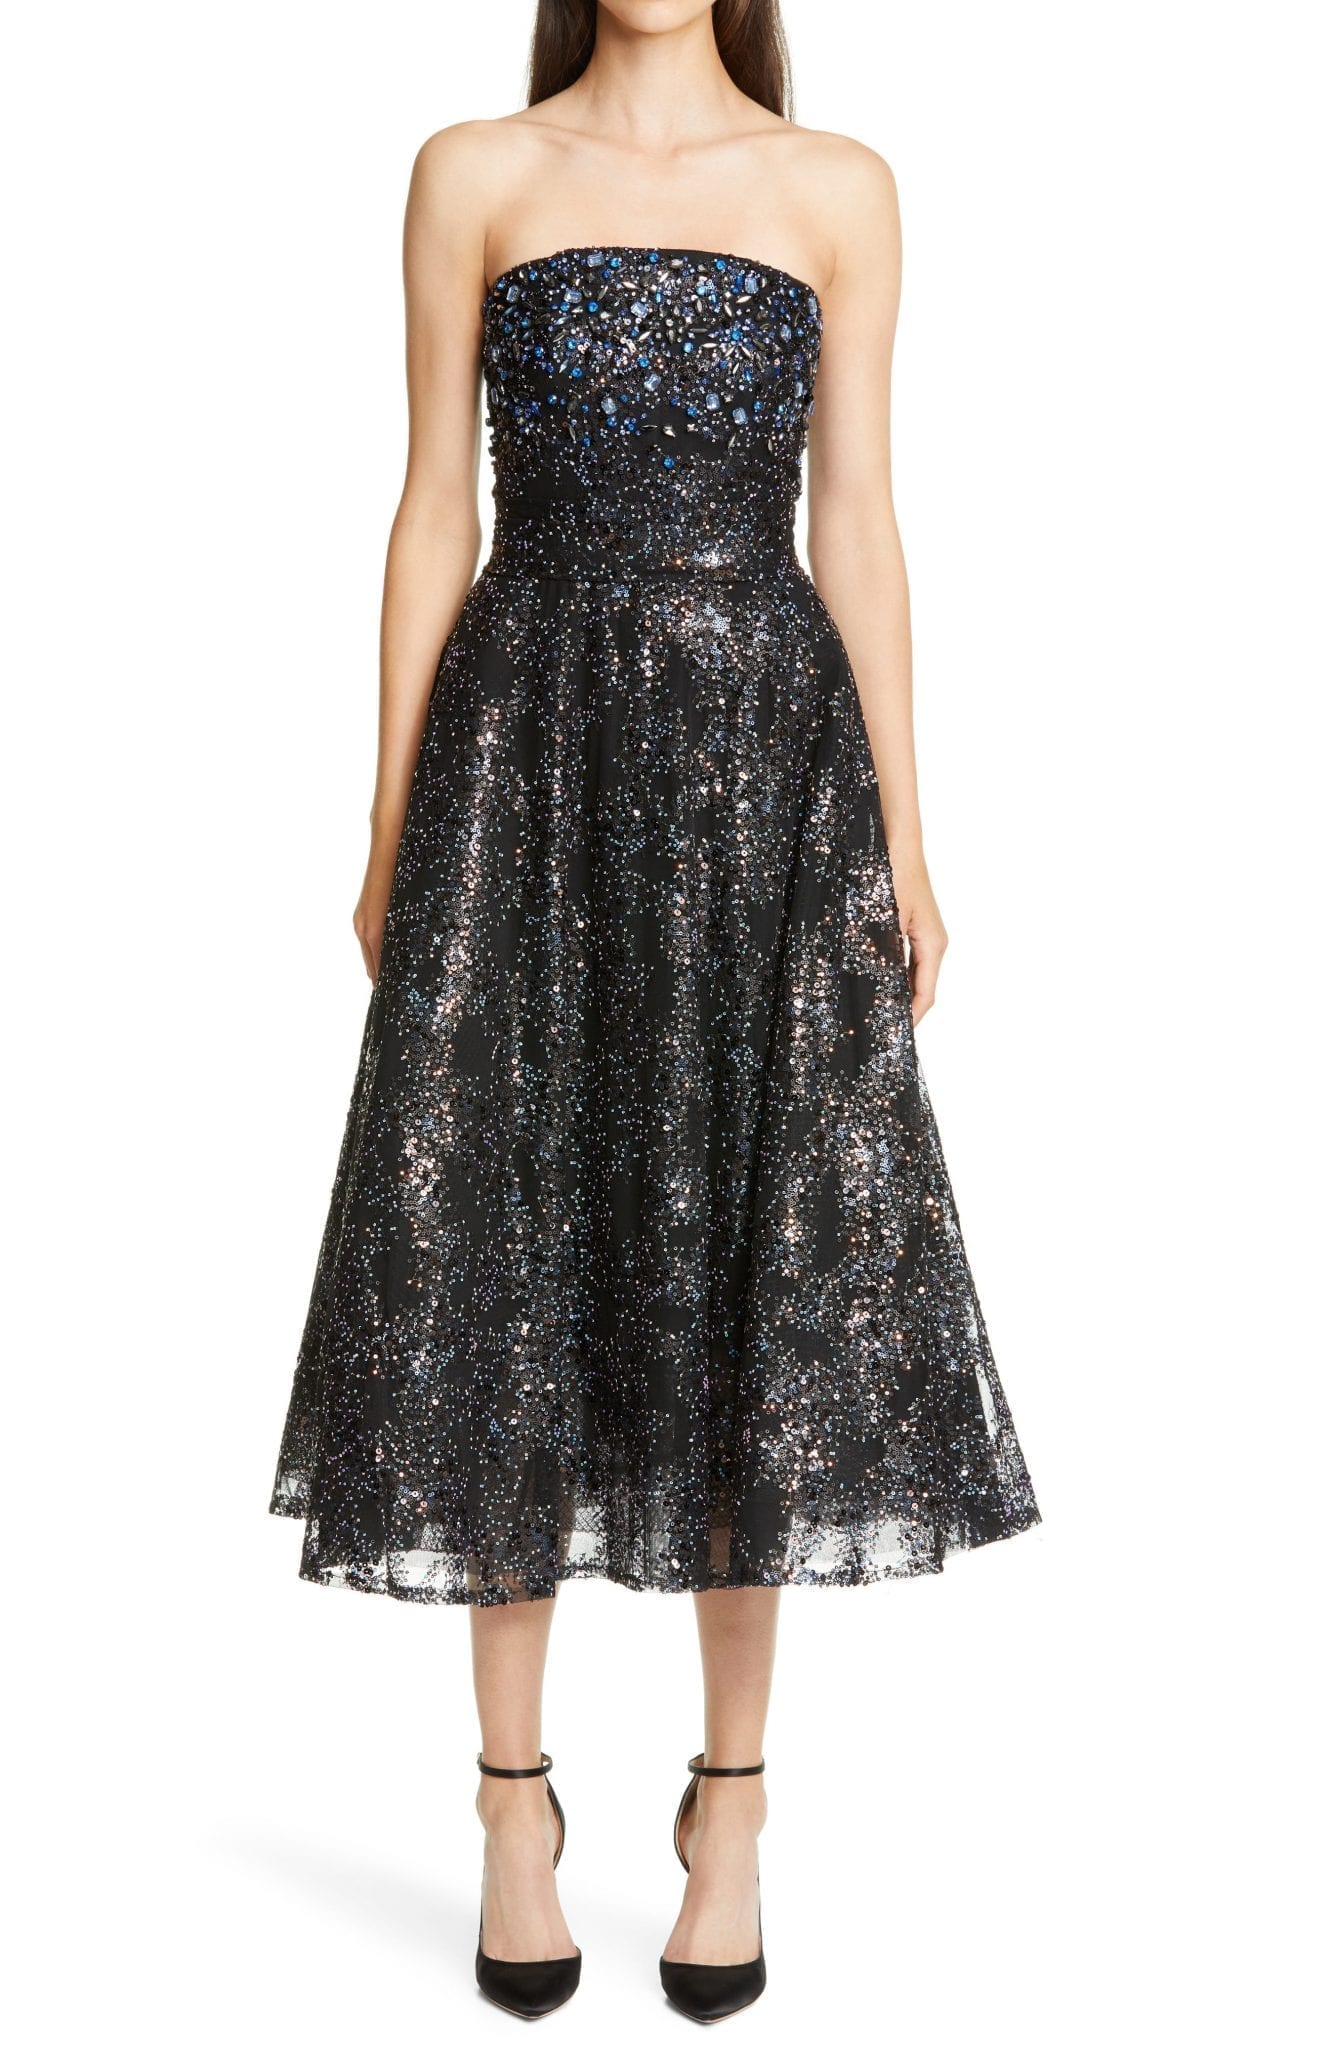 PAMELLA ROLAND Embellished Strapless Fit & Flare Midi Dress